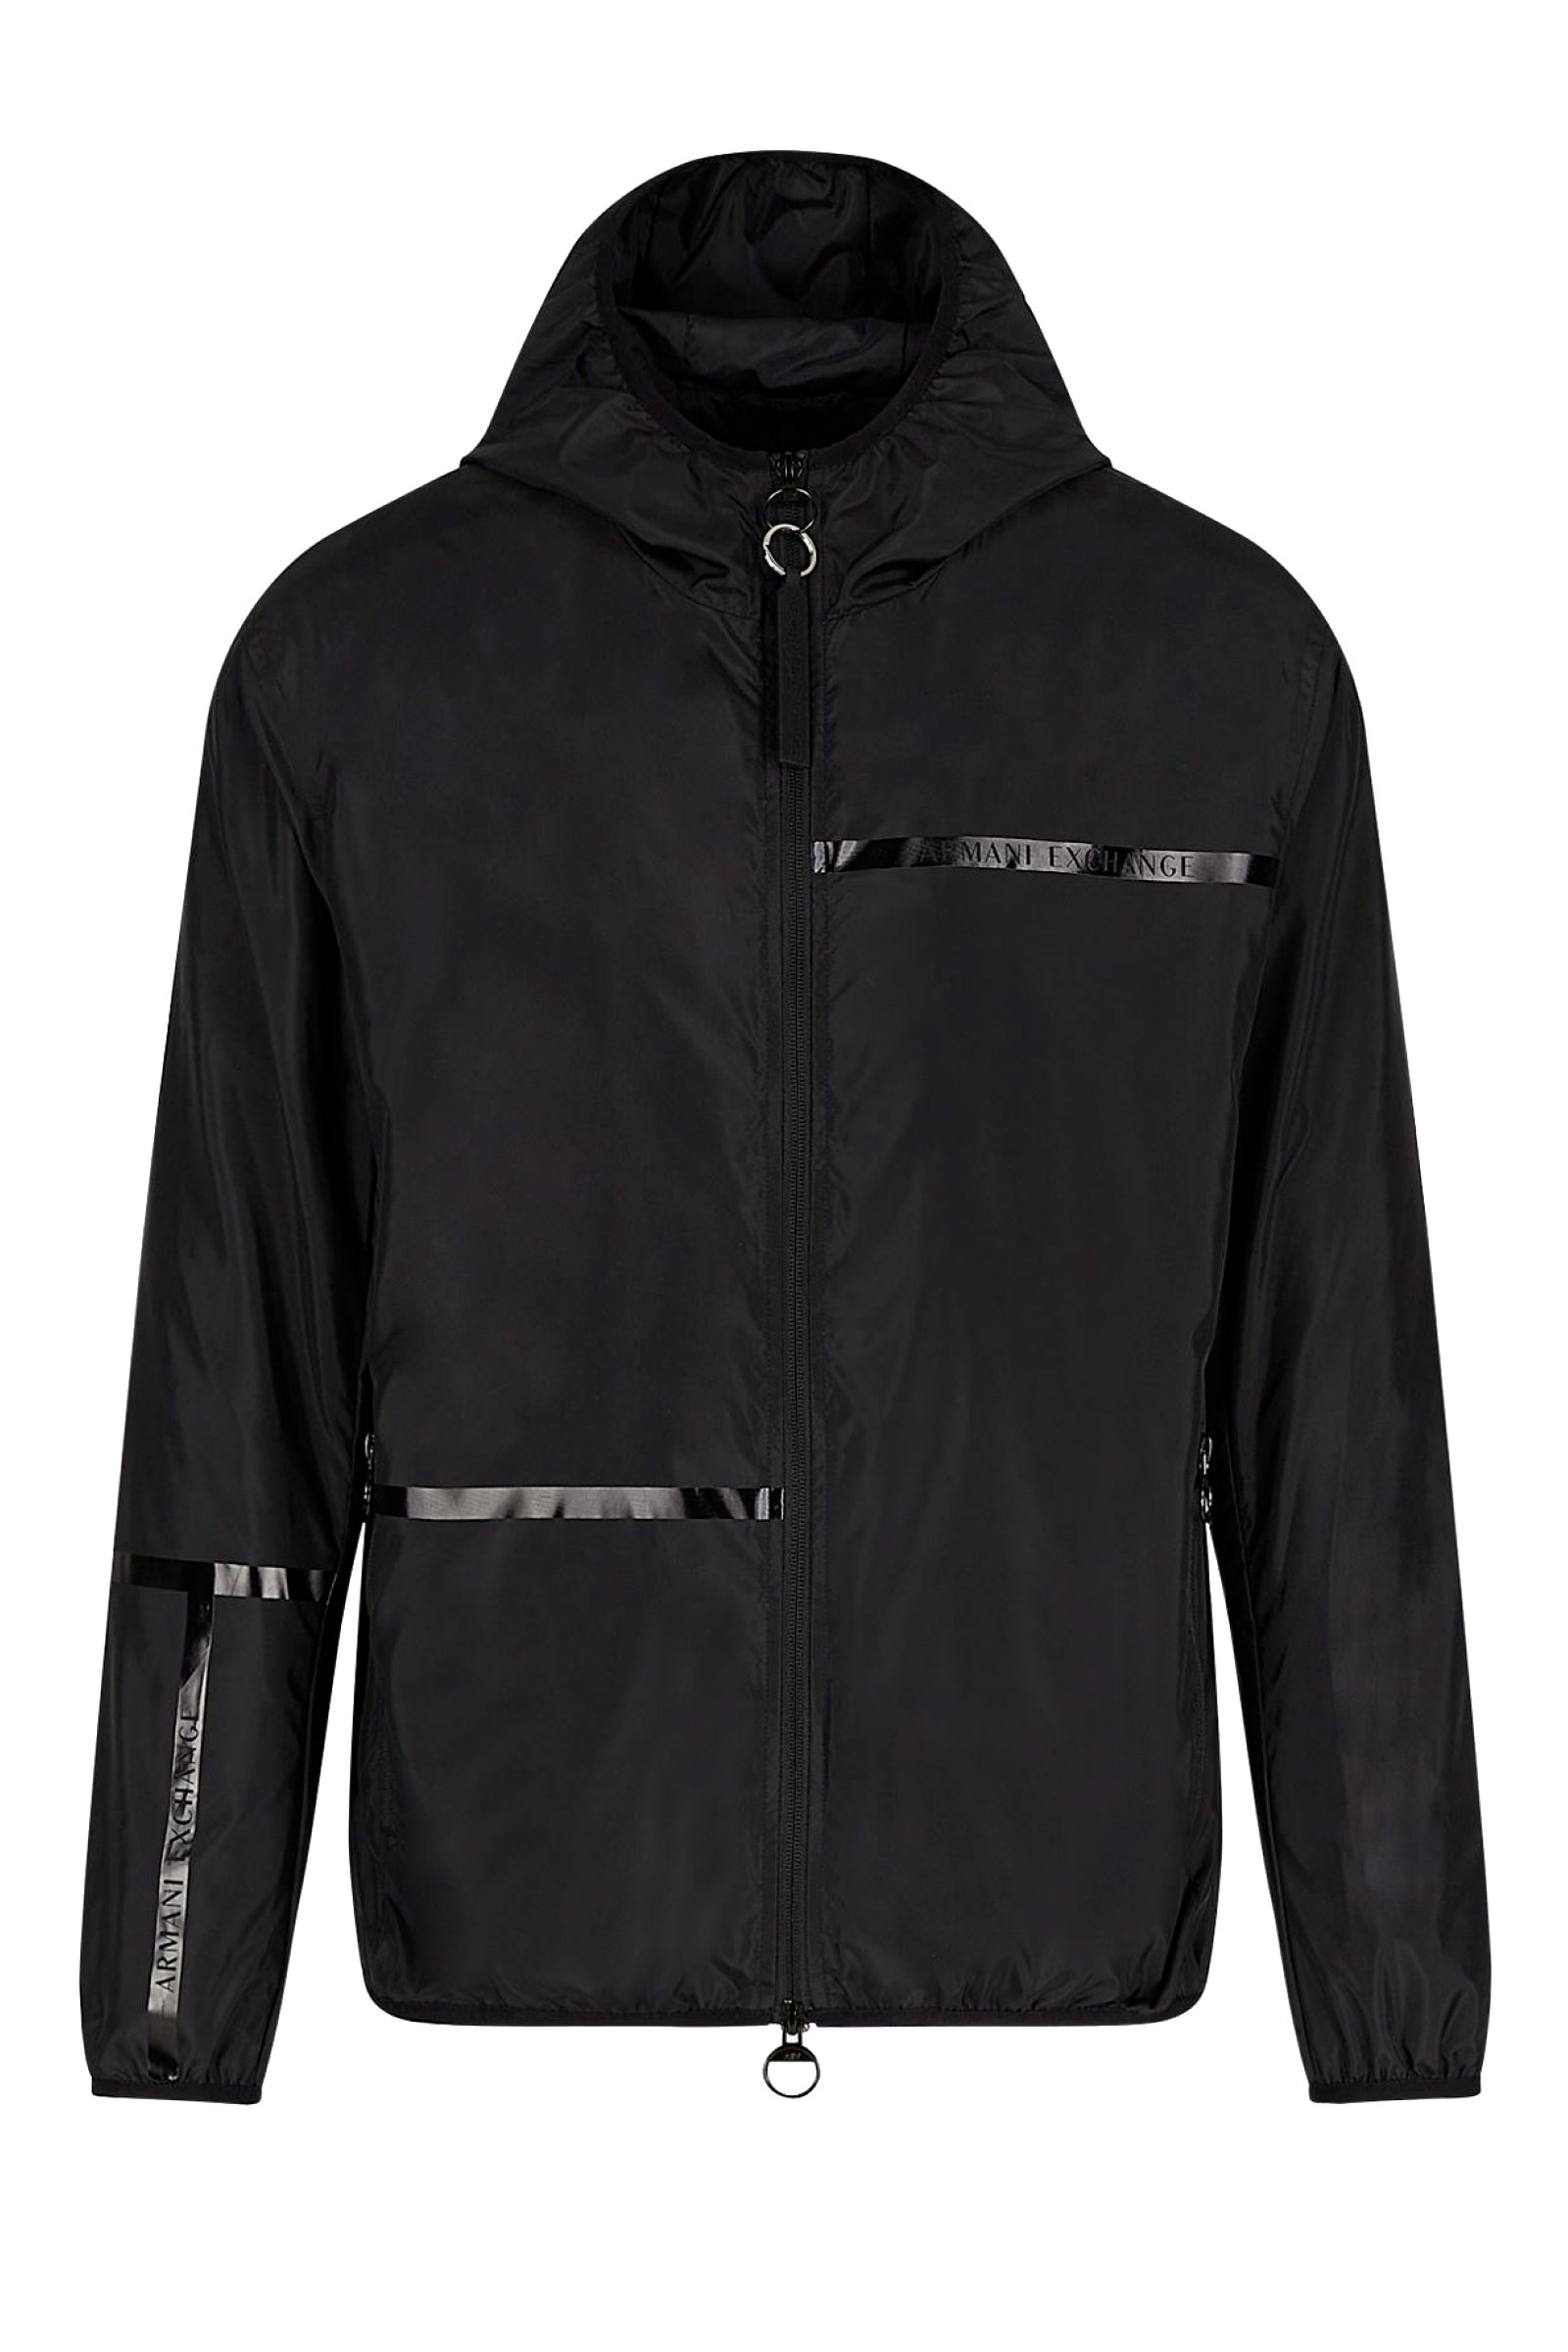 ARMANI EXCHANGE Men's jacket ARMANI EXCHANGE | Jacket | 3KZB43 ZNKRZ1200